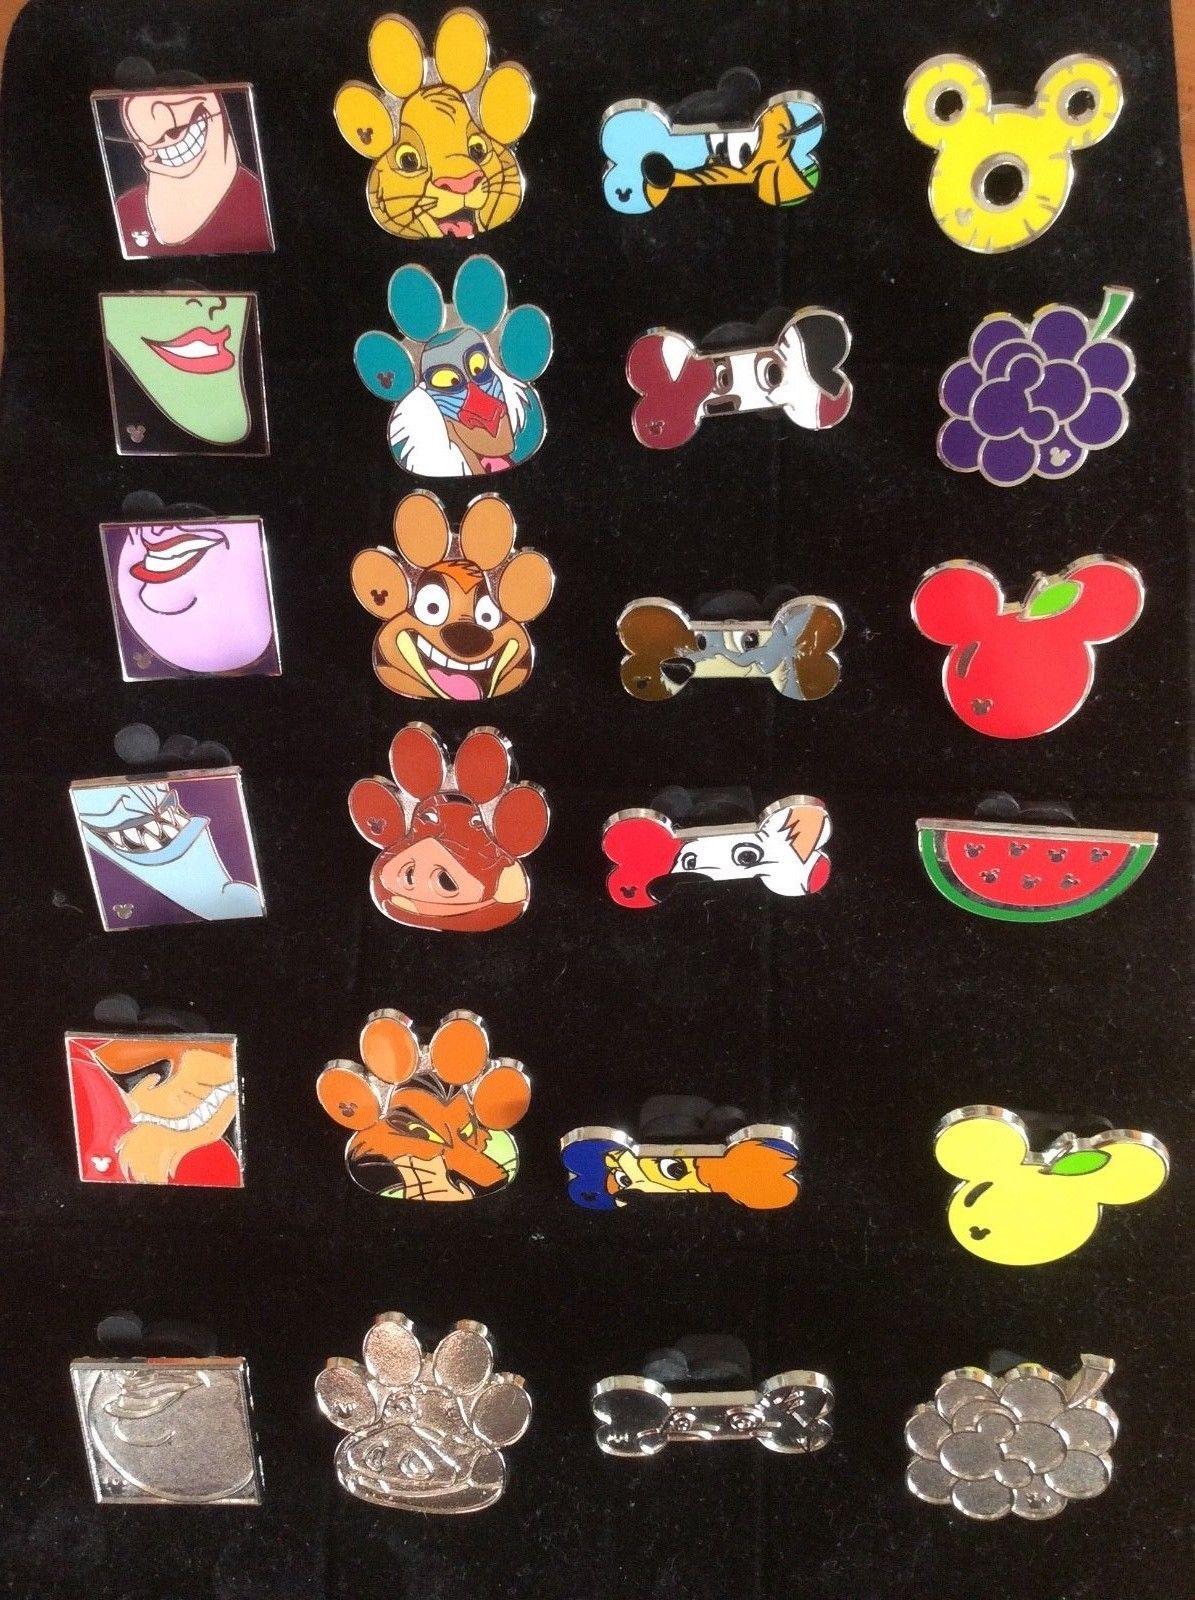 ccf34dea4b67 #disney Disney Trading Pins - 4 Complete Sets Hidden Mickey 2017 Paws Bones  Fruit please retweet